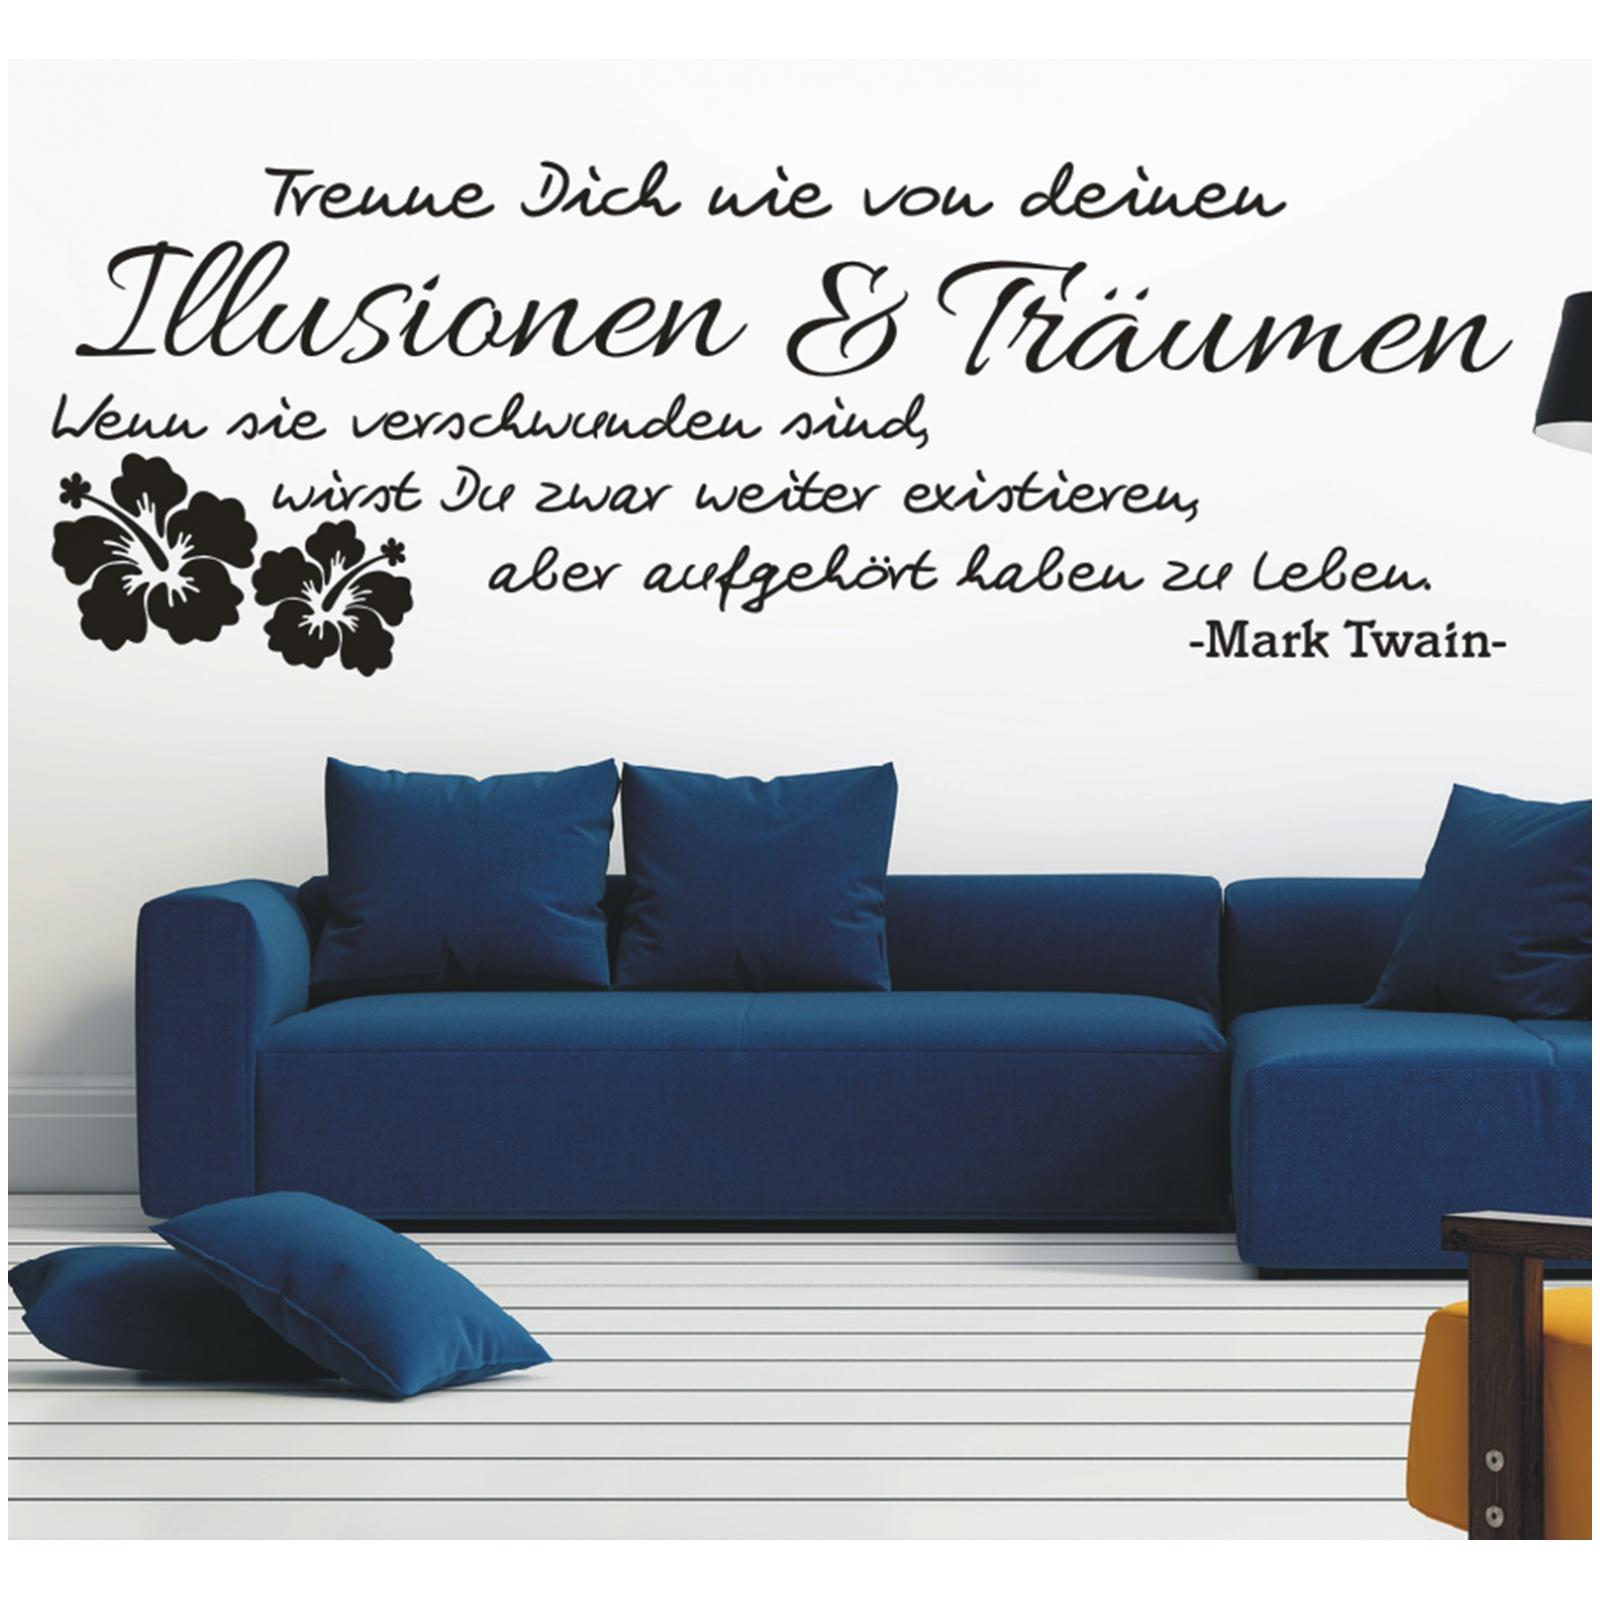 Spruch-WANDTATTOO-Illusionen-Traeumen-Leben-Twain-Zitat-Wandaufkleber-Sticker-6 Indexbild 3